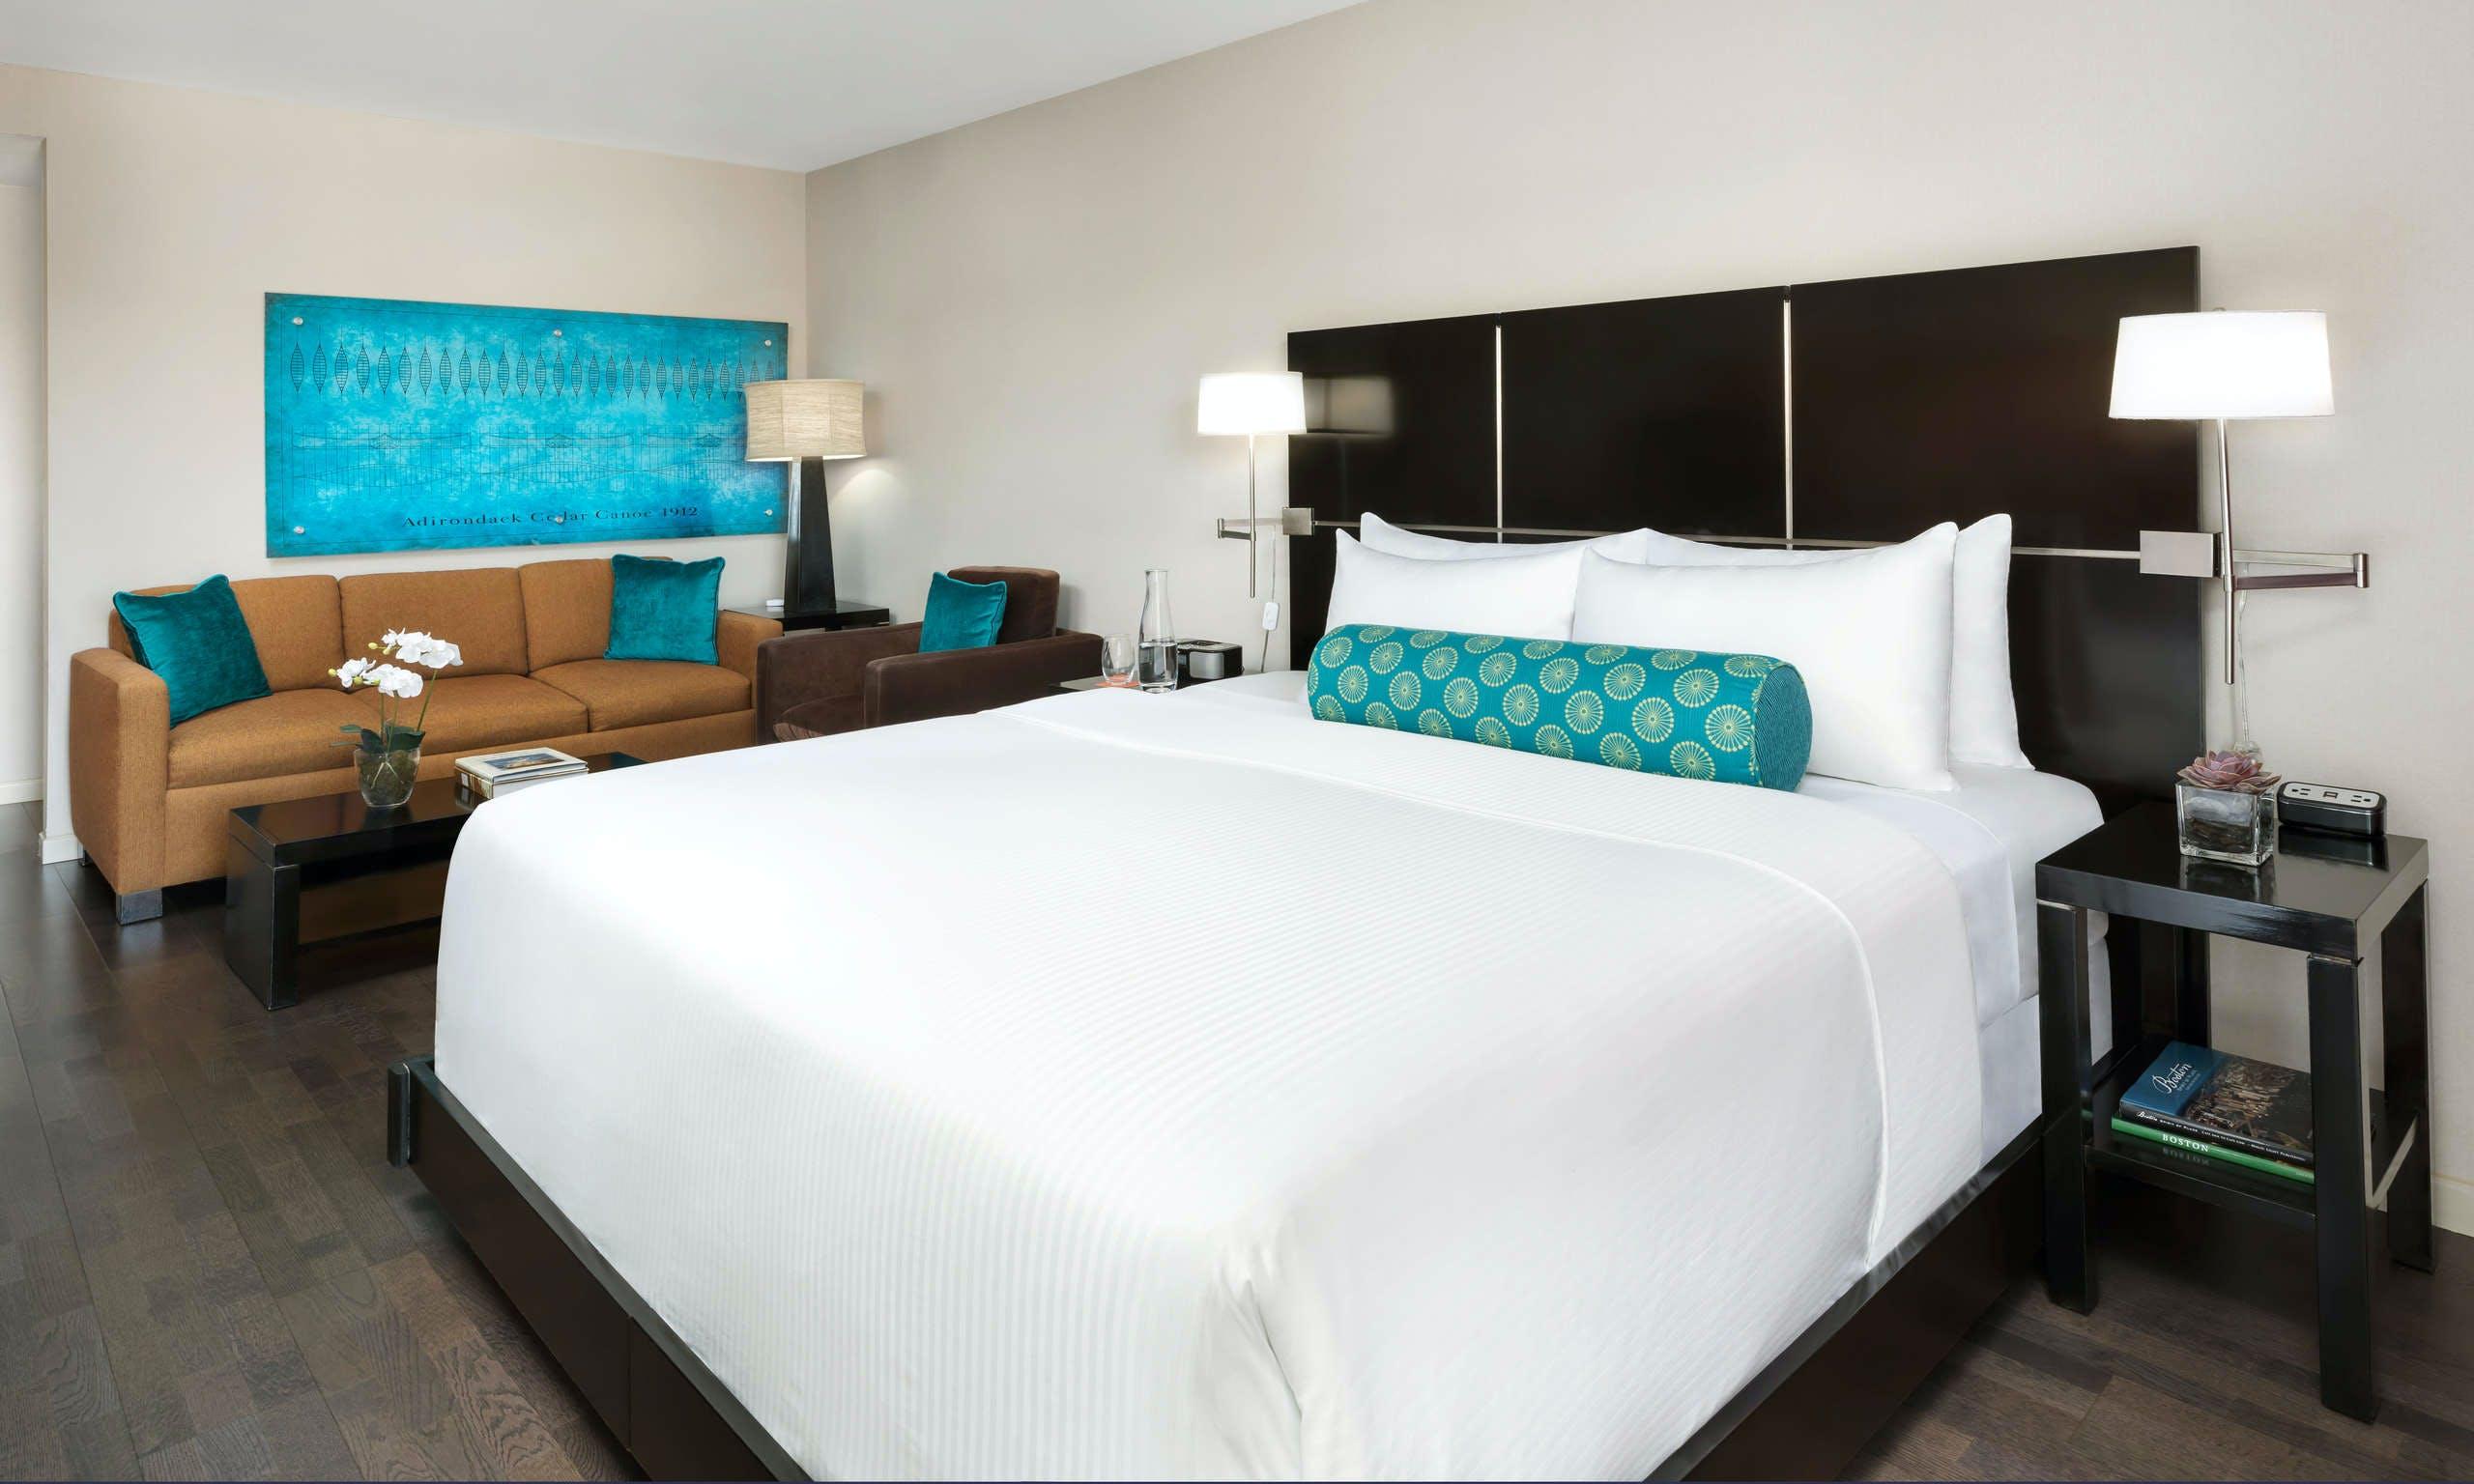 Check Last Minute Waltham Hotel Deals